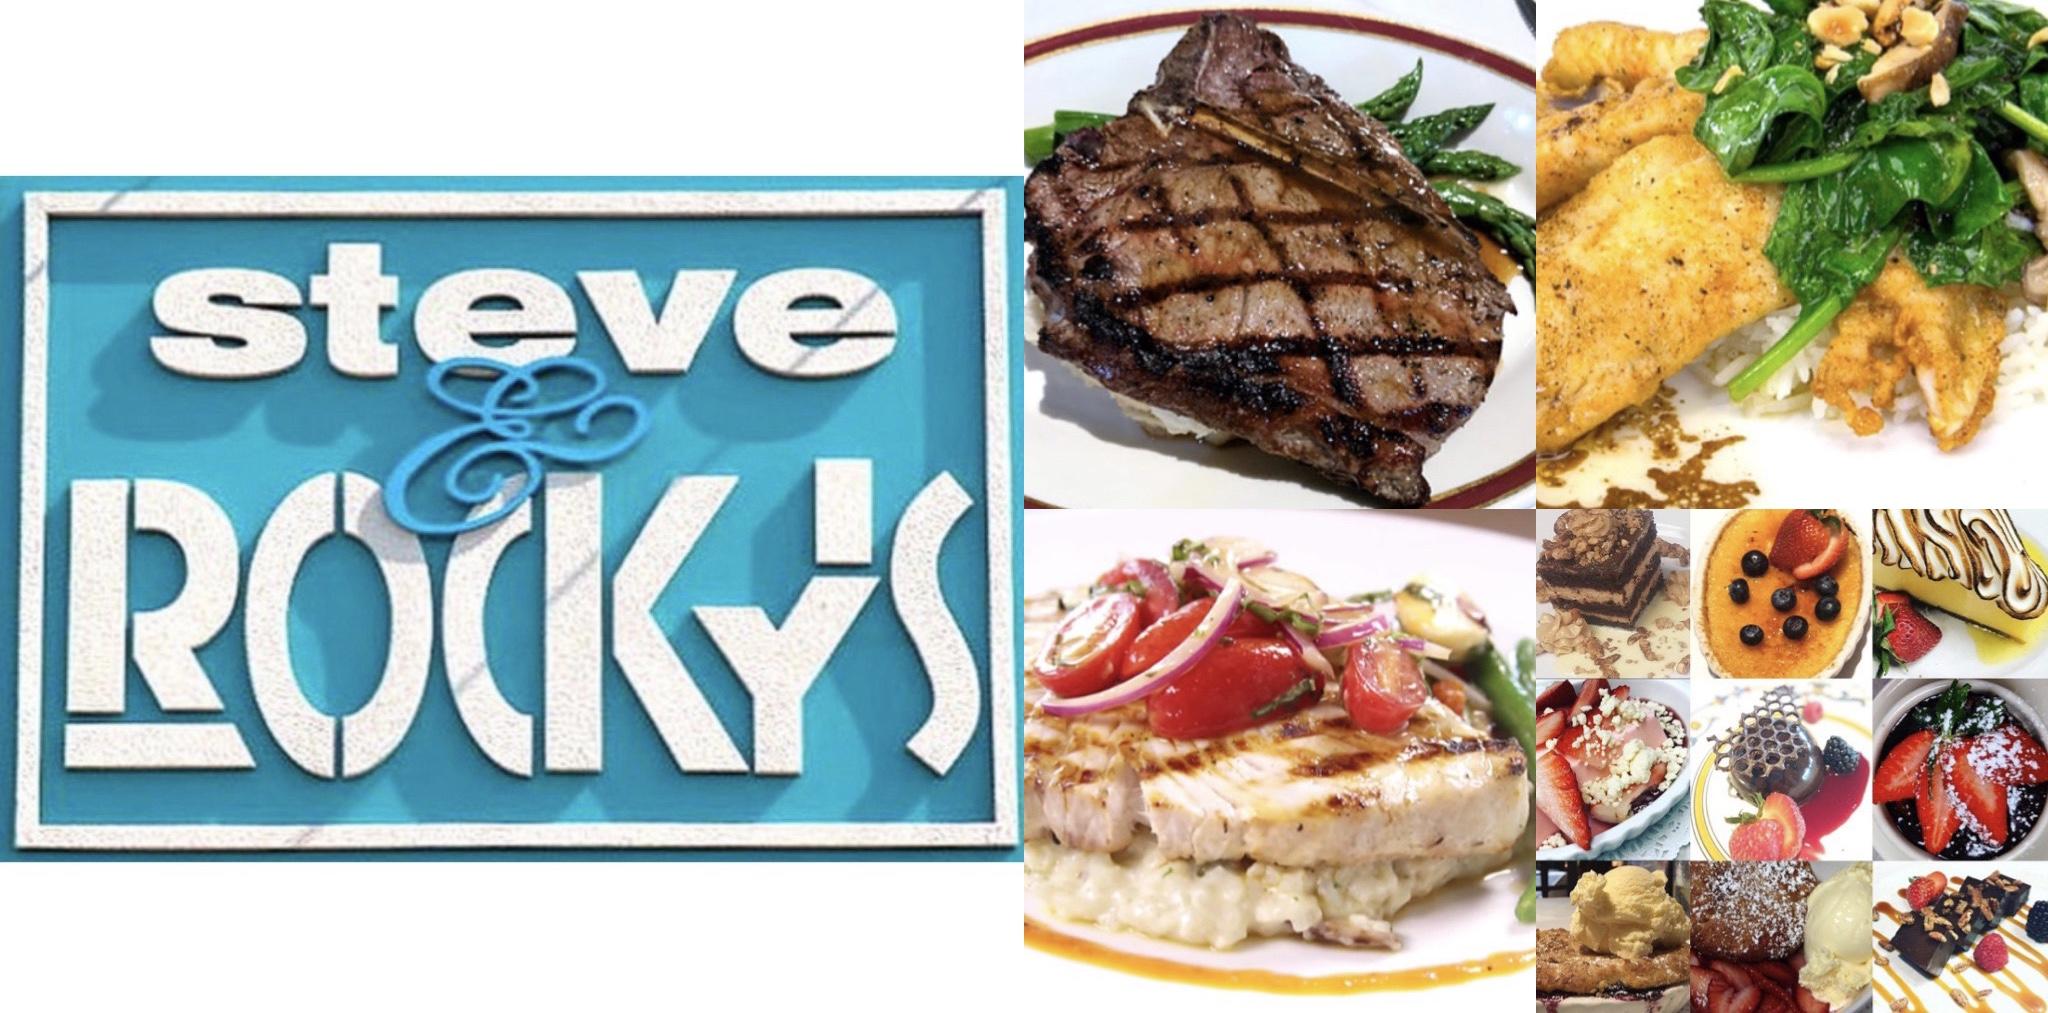 Steve and Rocky's Restaurant